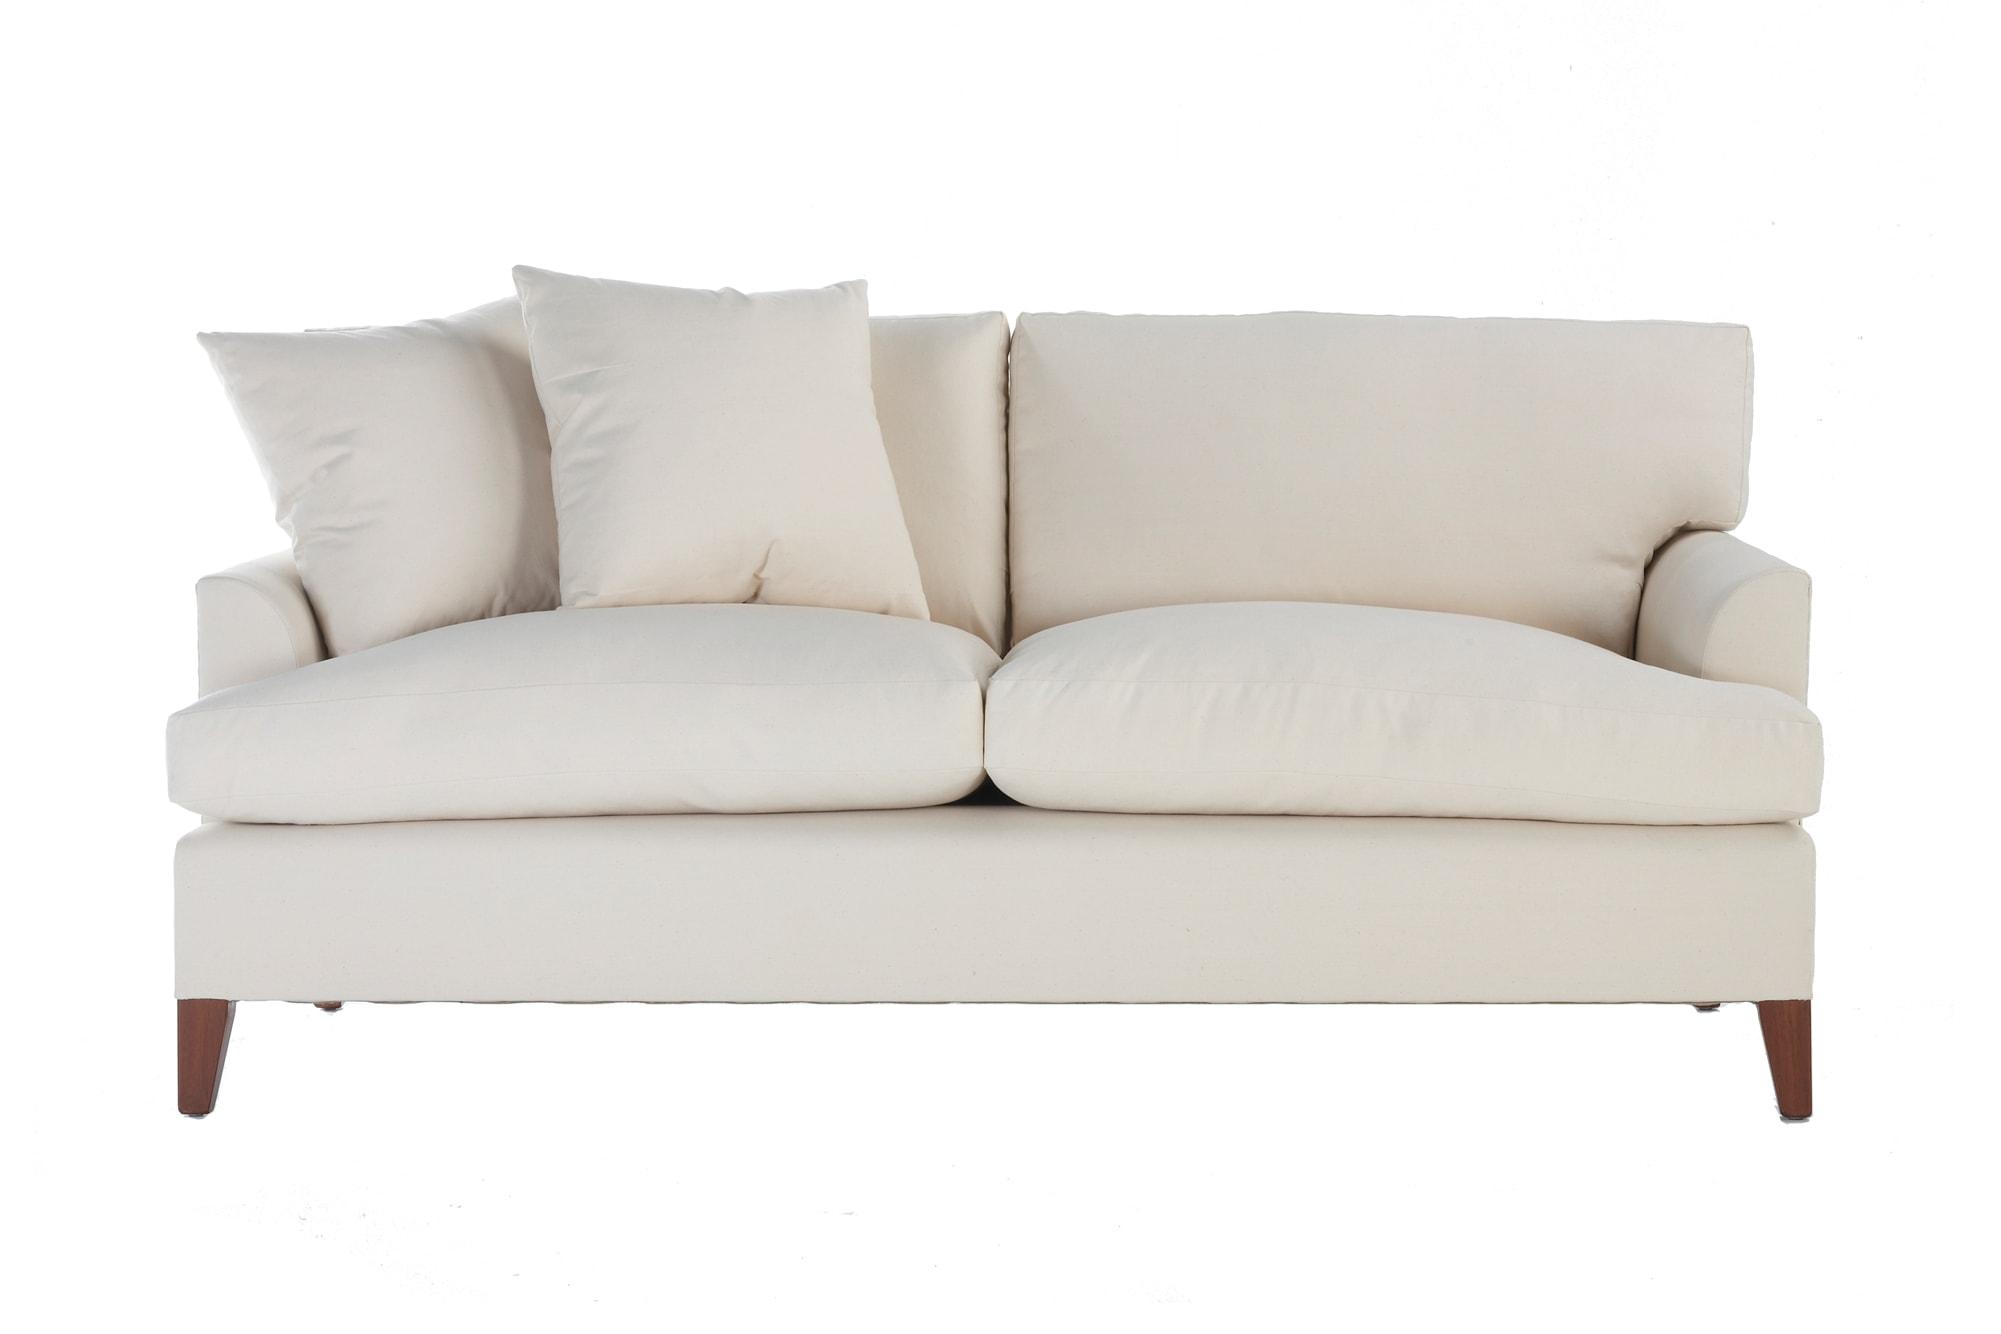 Sofa_width_side_cushion Min